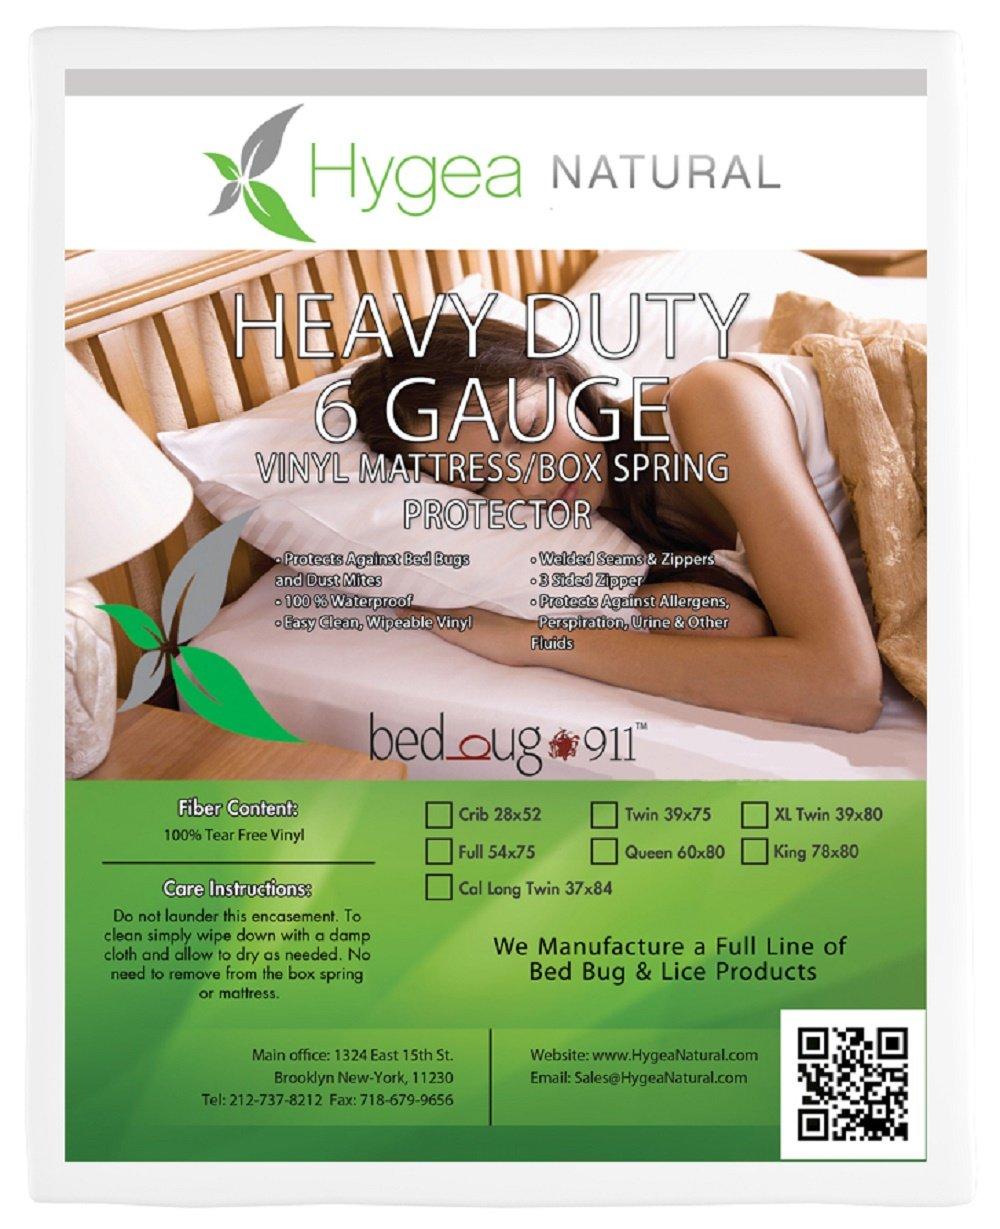 Hygea Natural | Vinyl | Bed Bug Box Spring Cover, Mattress Cover - Size XL Twin California King